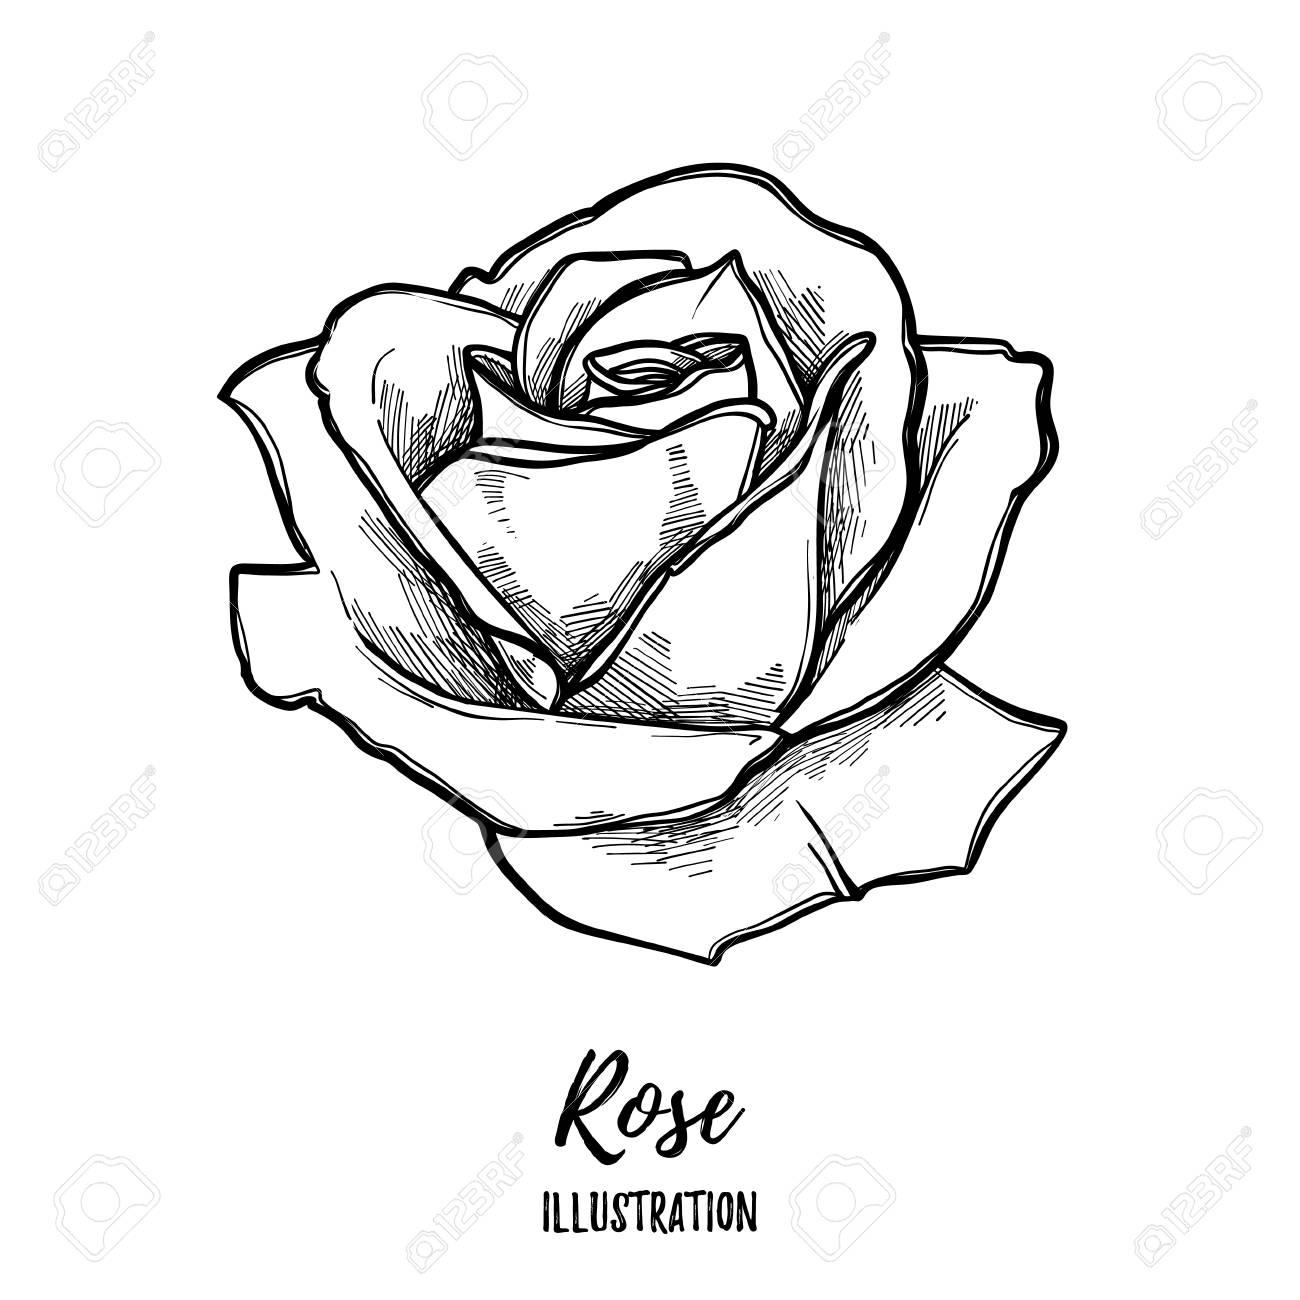 Hand drawn vector illustration rose floral tattoo sketch hand drawn vector illustration rose floral tattoo sketch perfect for tattooing invitations m4hsunfo